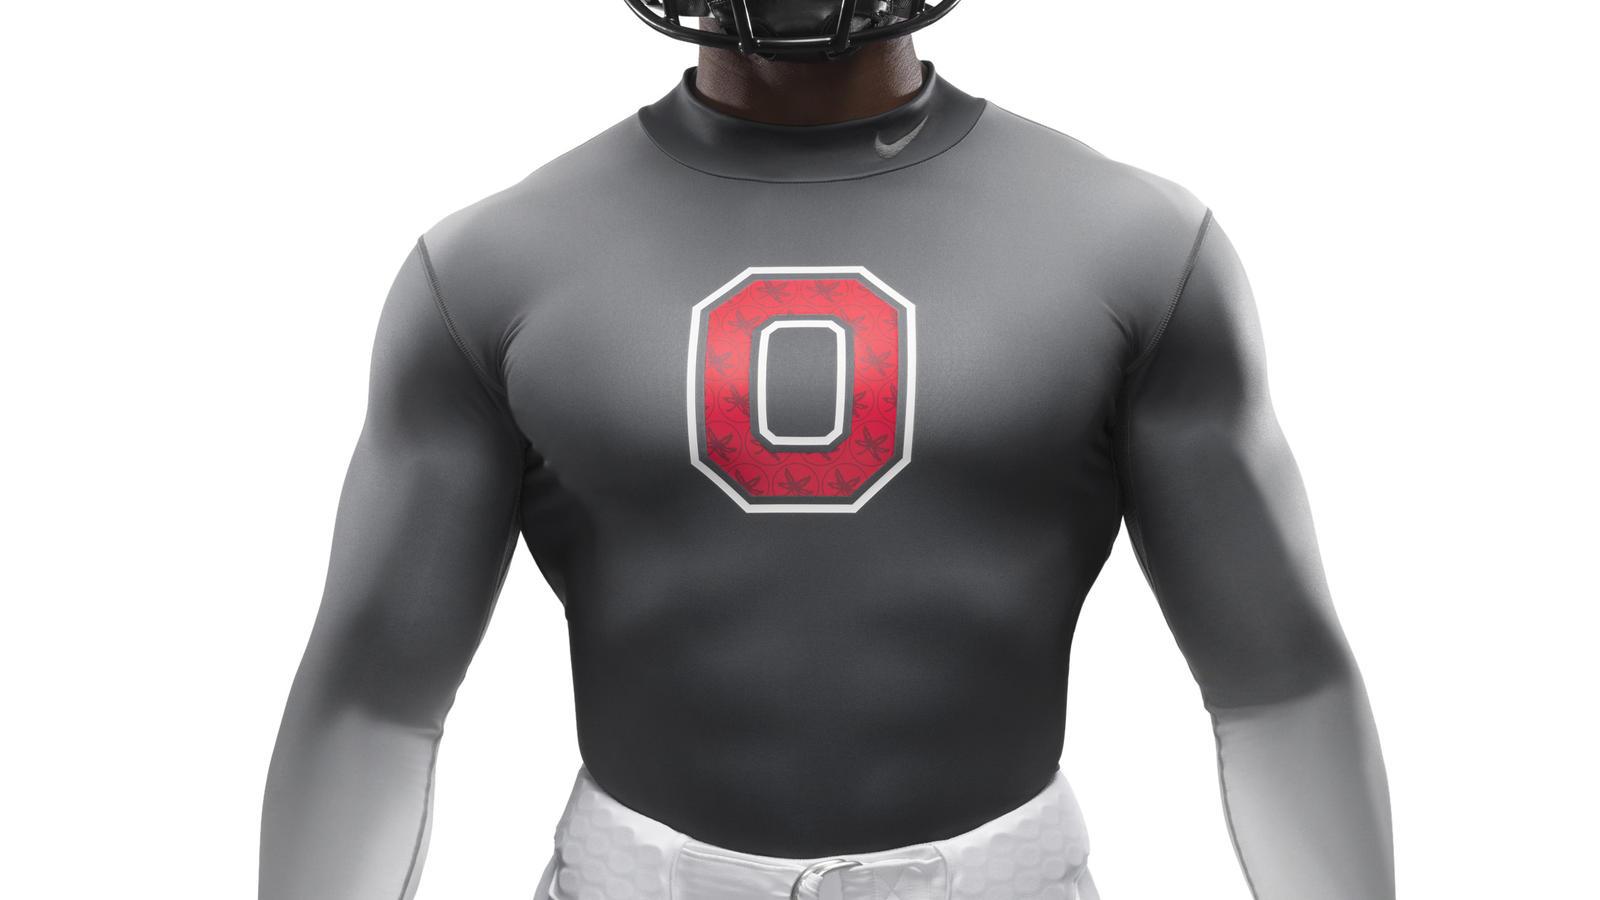 ncaa_fb13_uniforms_ohio_base_layer_tightversion_0016